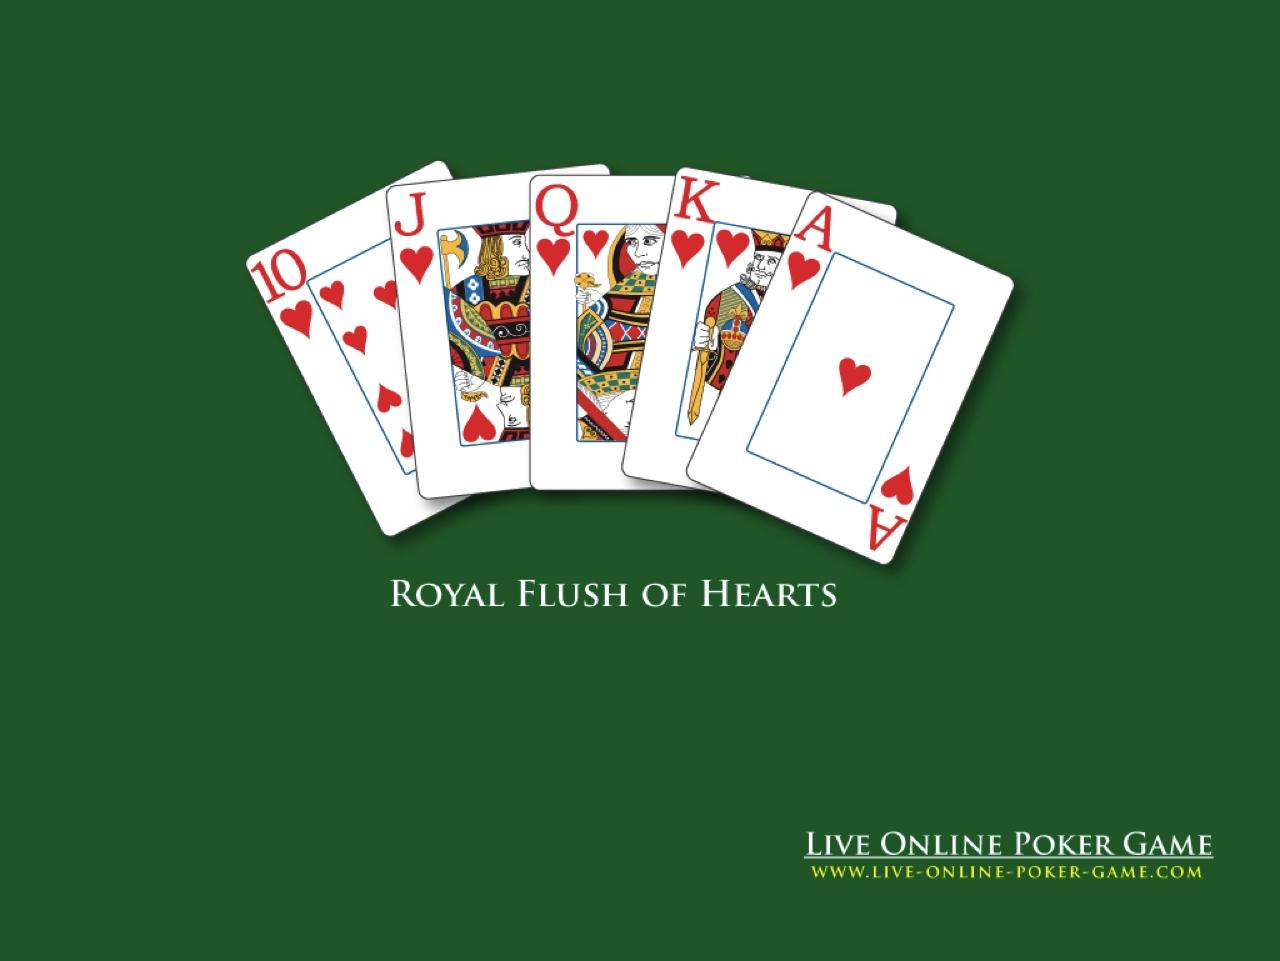 Electric Wallpaper 3d Ⓦallⓟapers Sfondi Poker